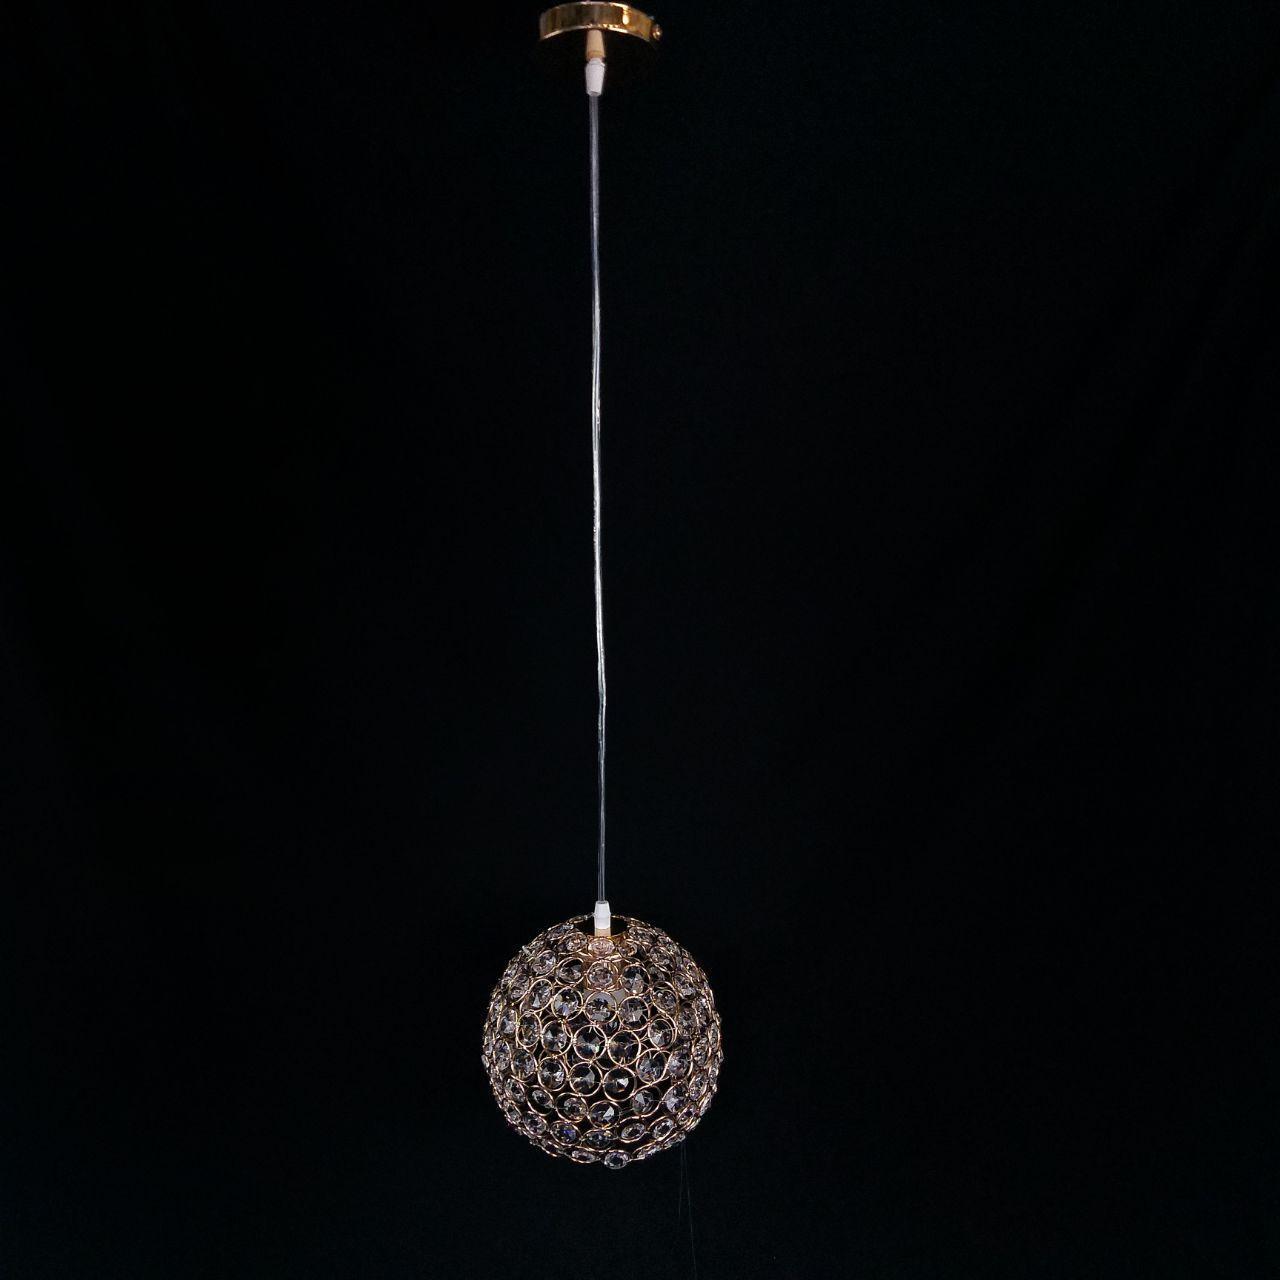 Люстра подвесная на одну лампу 29-1696/1(D200)FGD